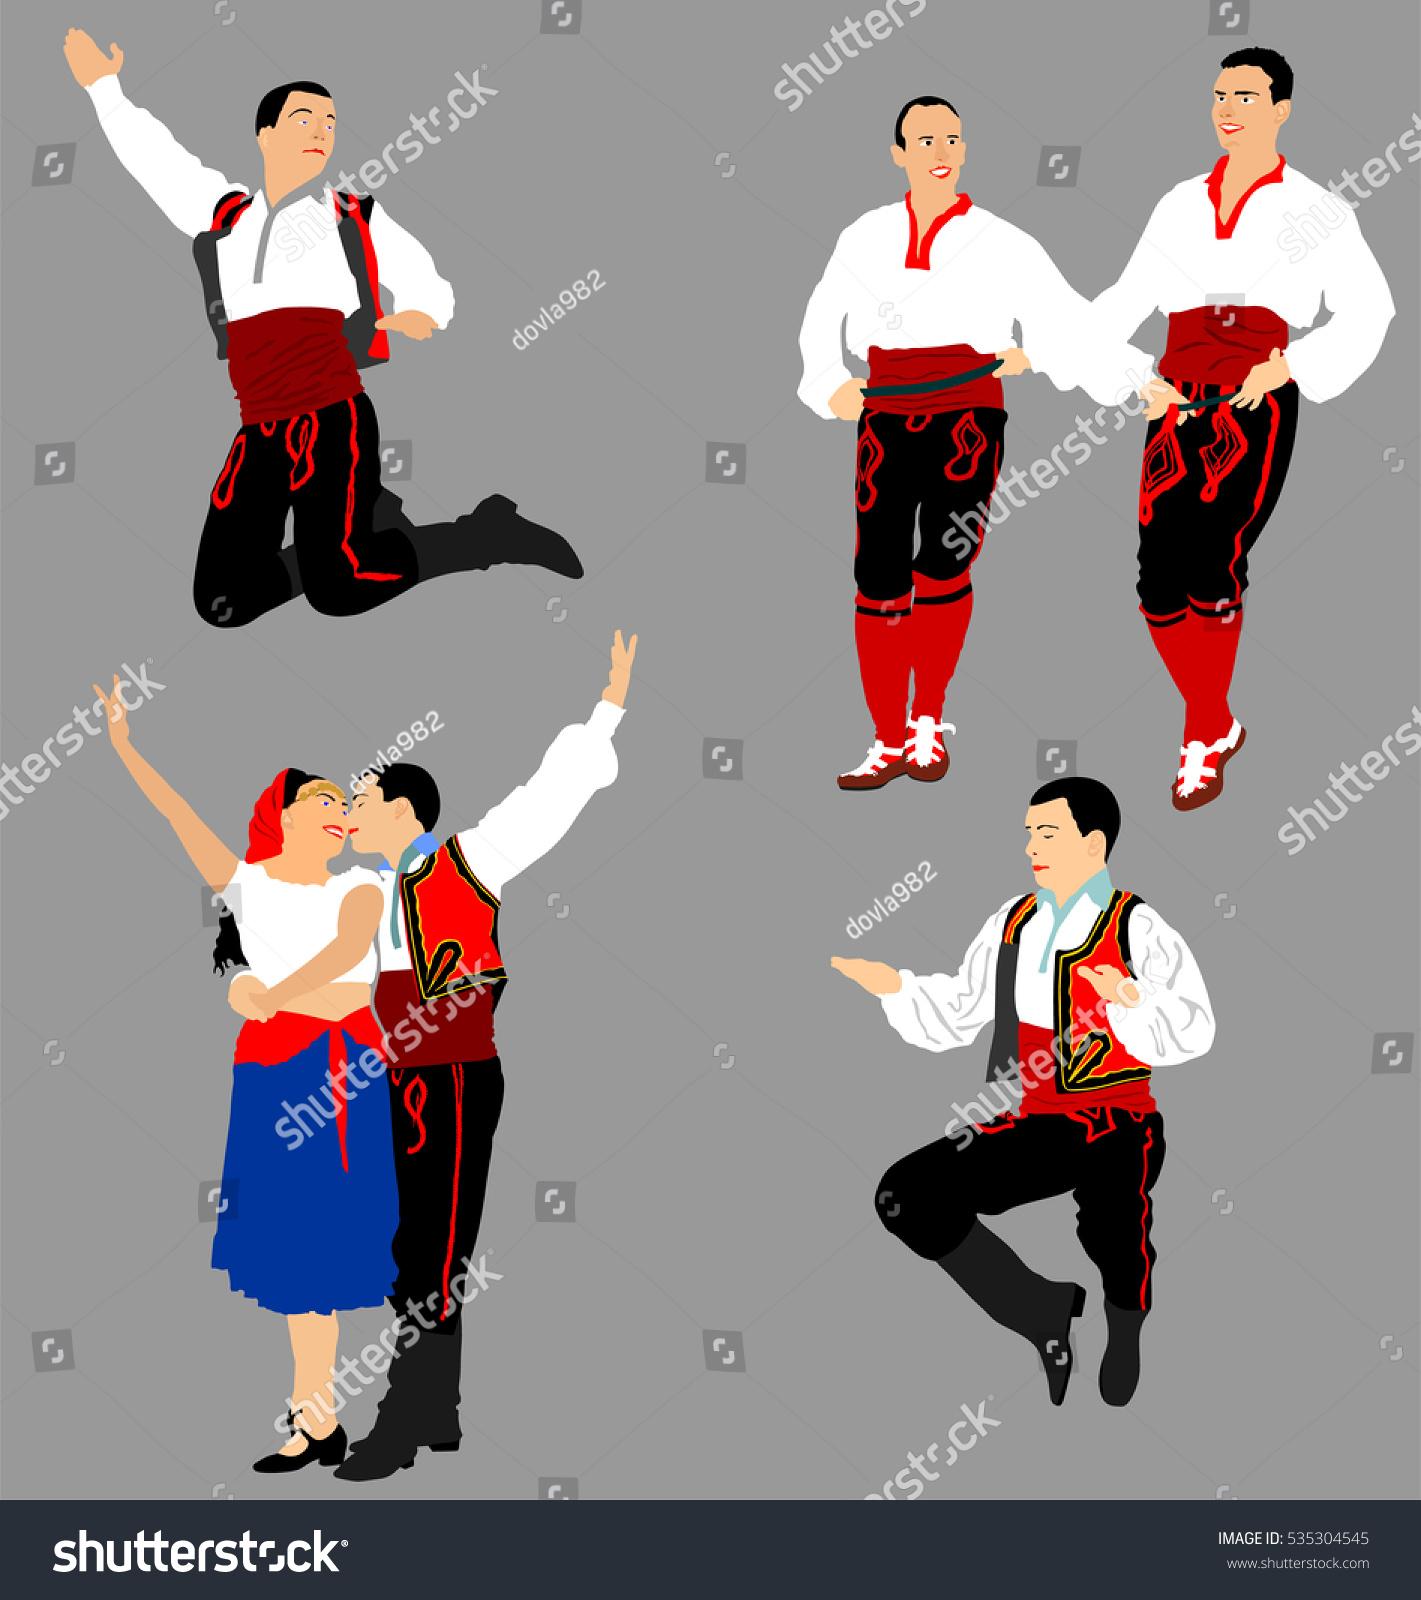 Bloch Dance Europe - Начало | Facebook